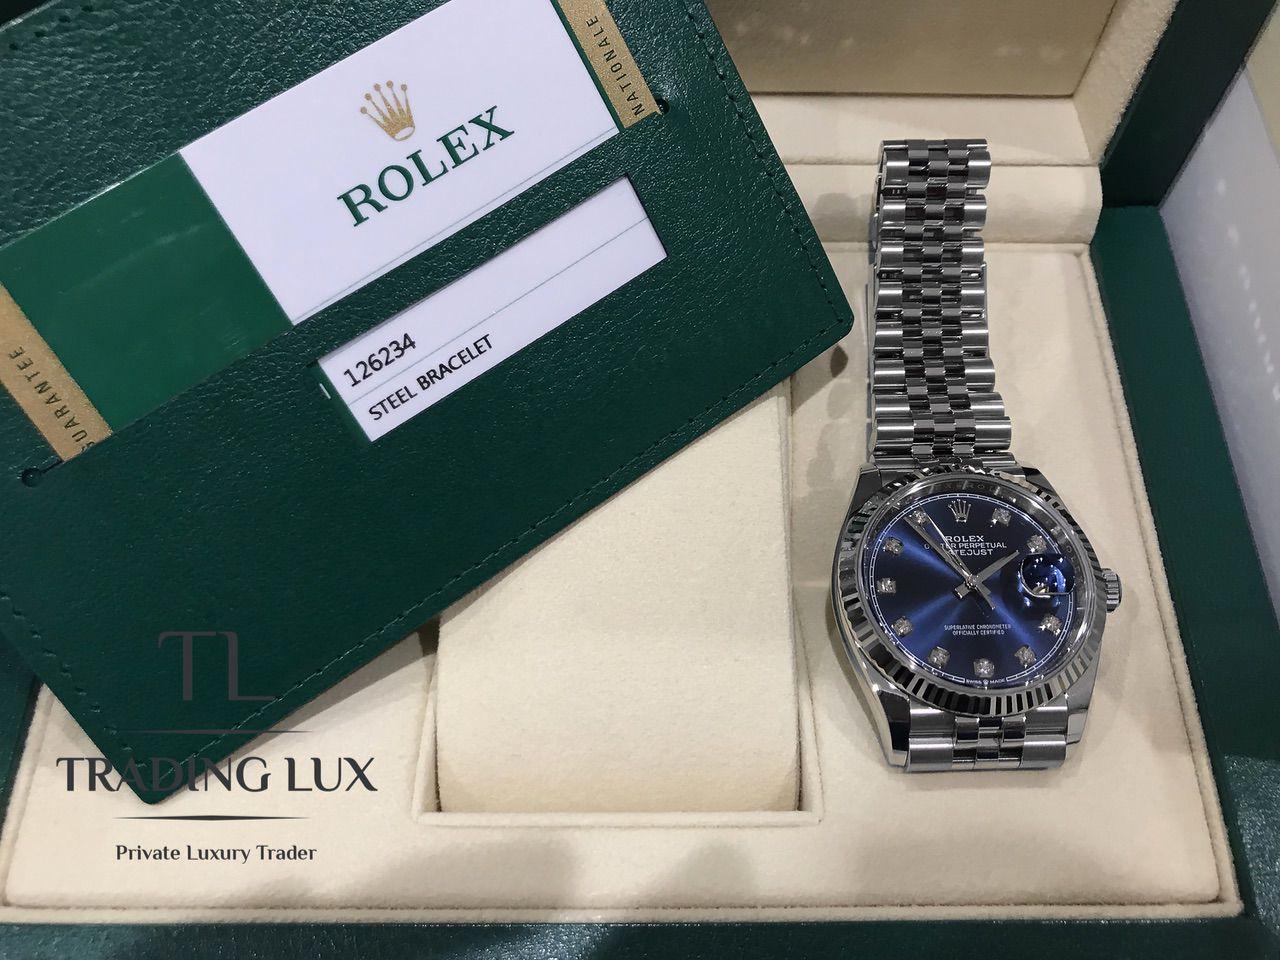 Rolex-Datejust-126234-11